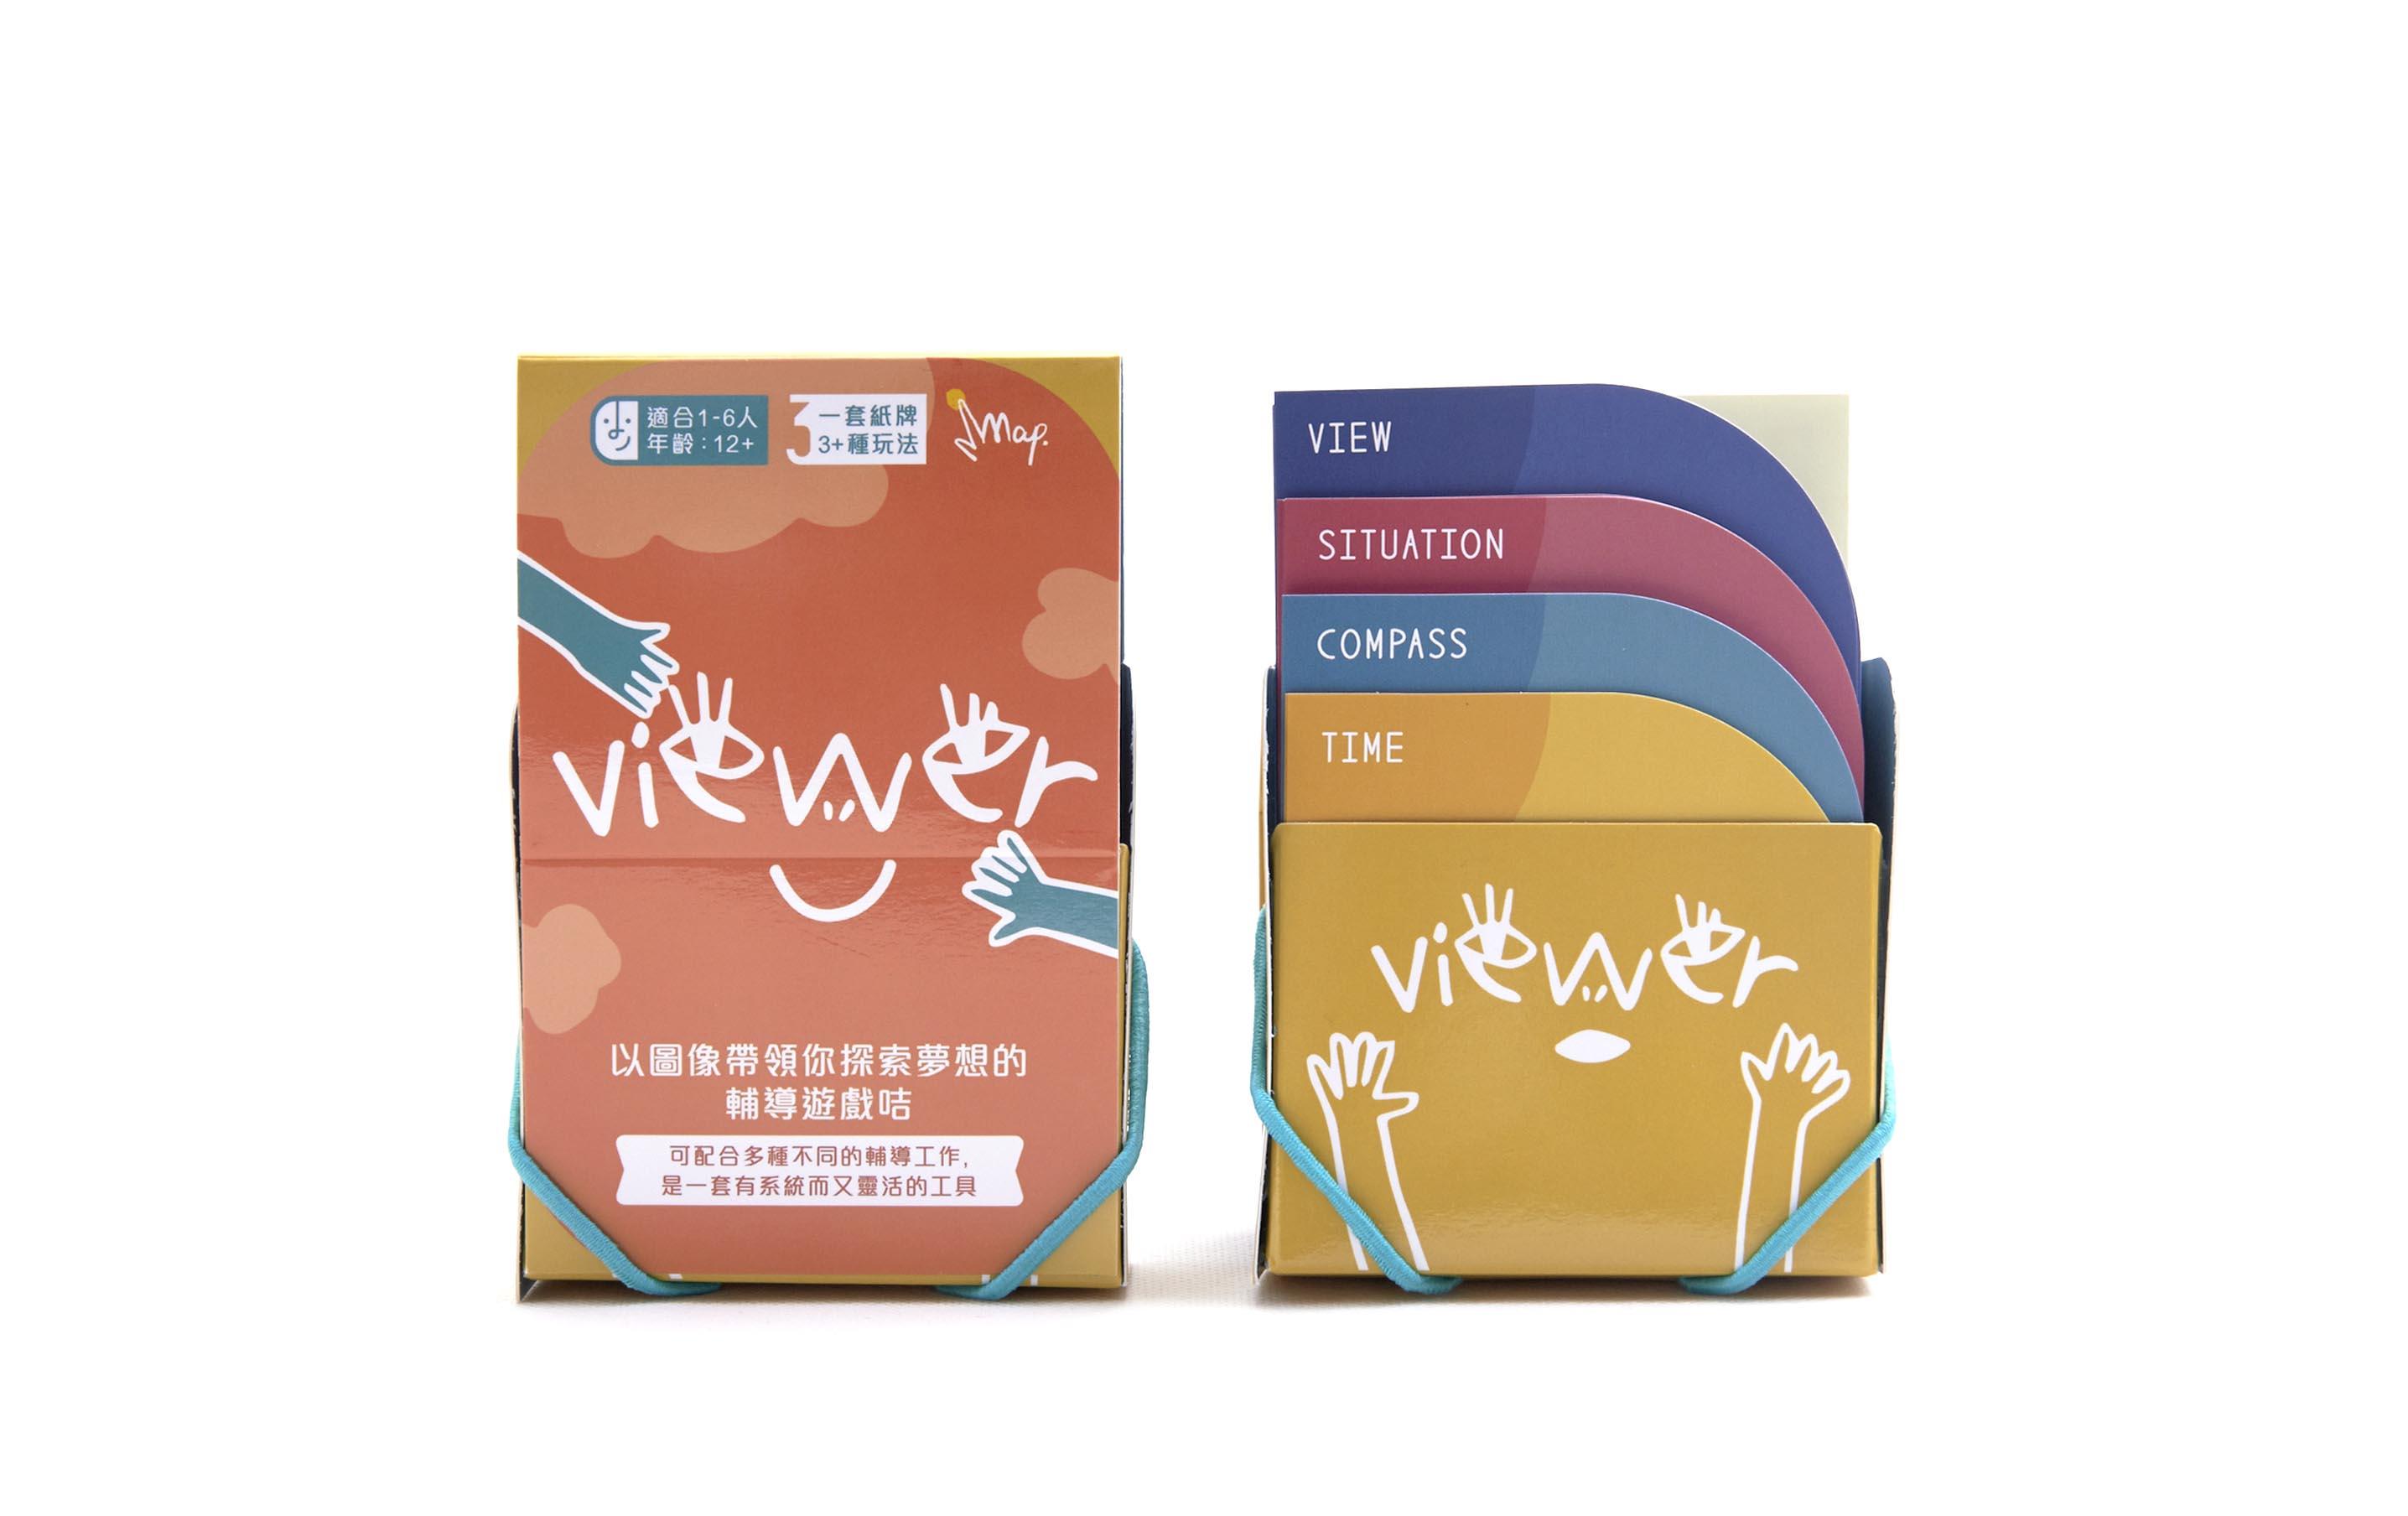 viwer08